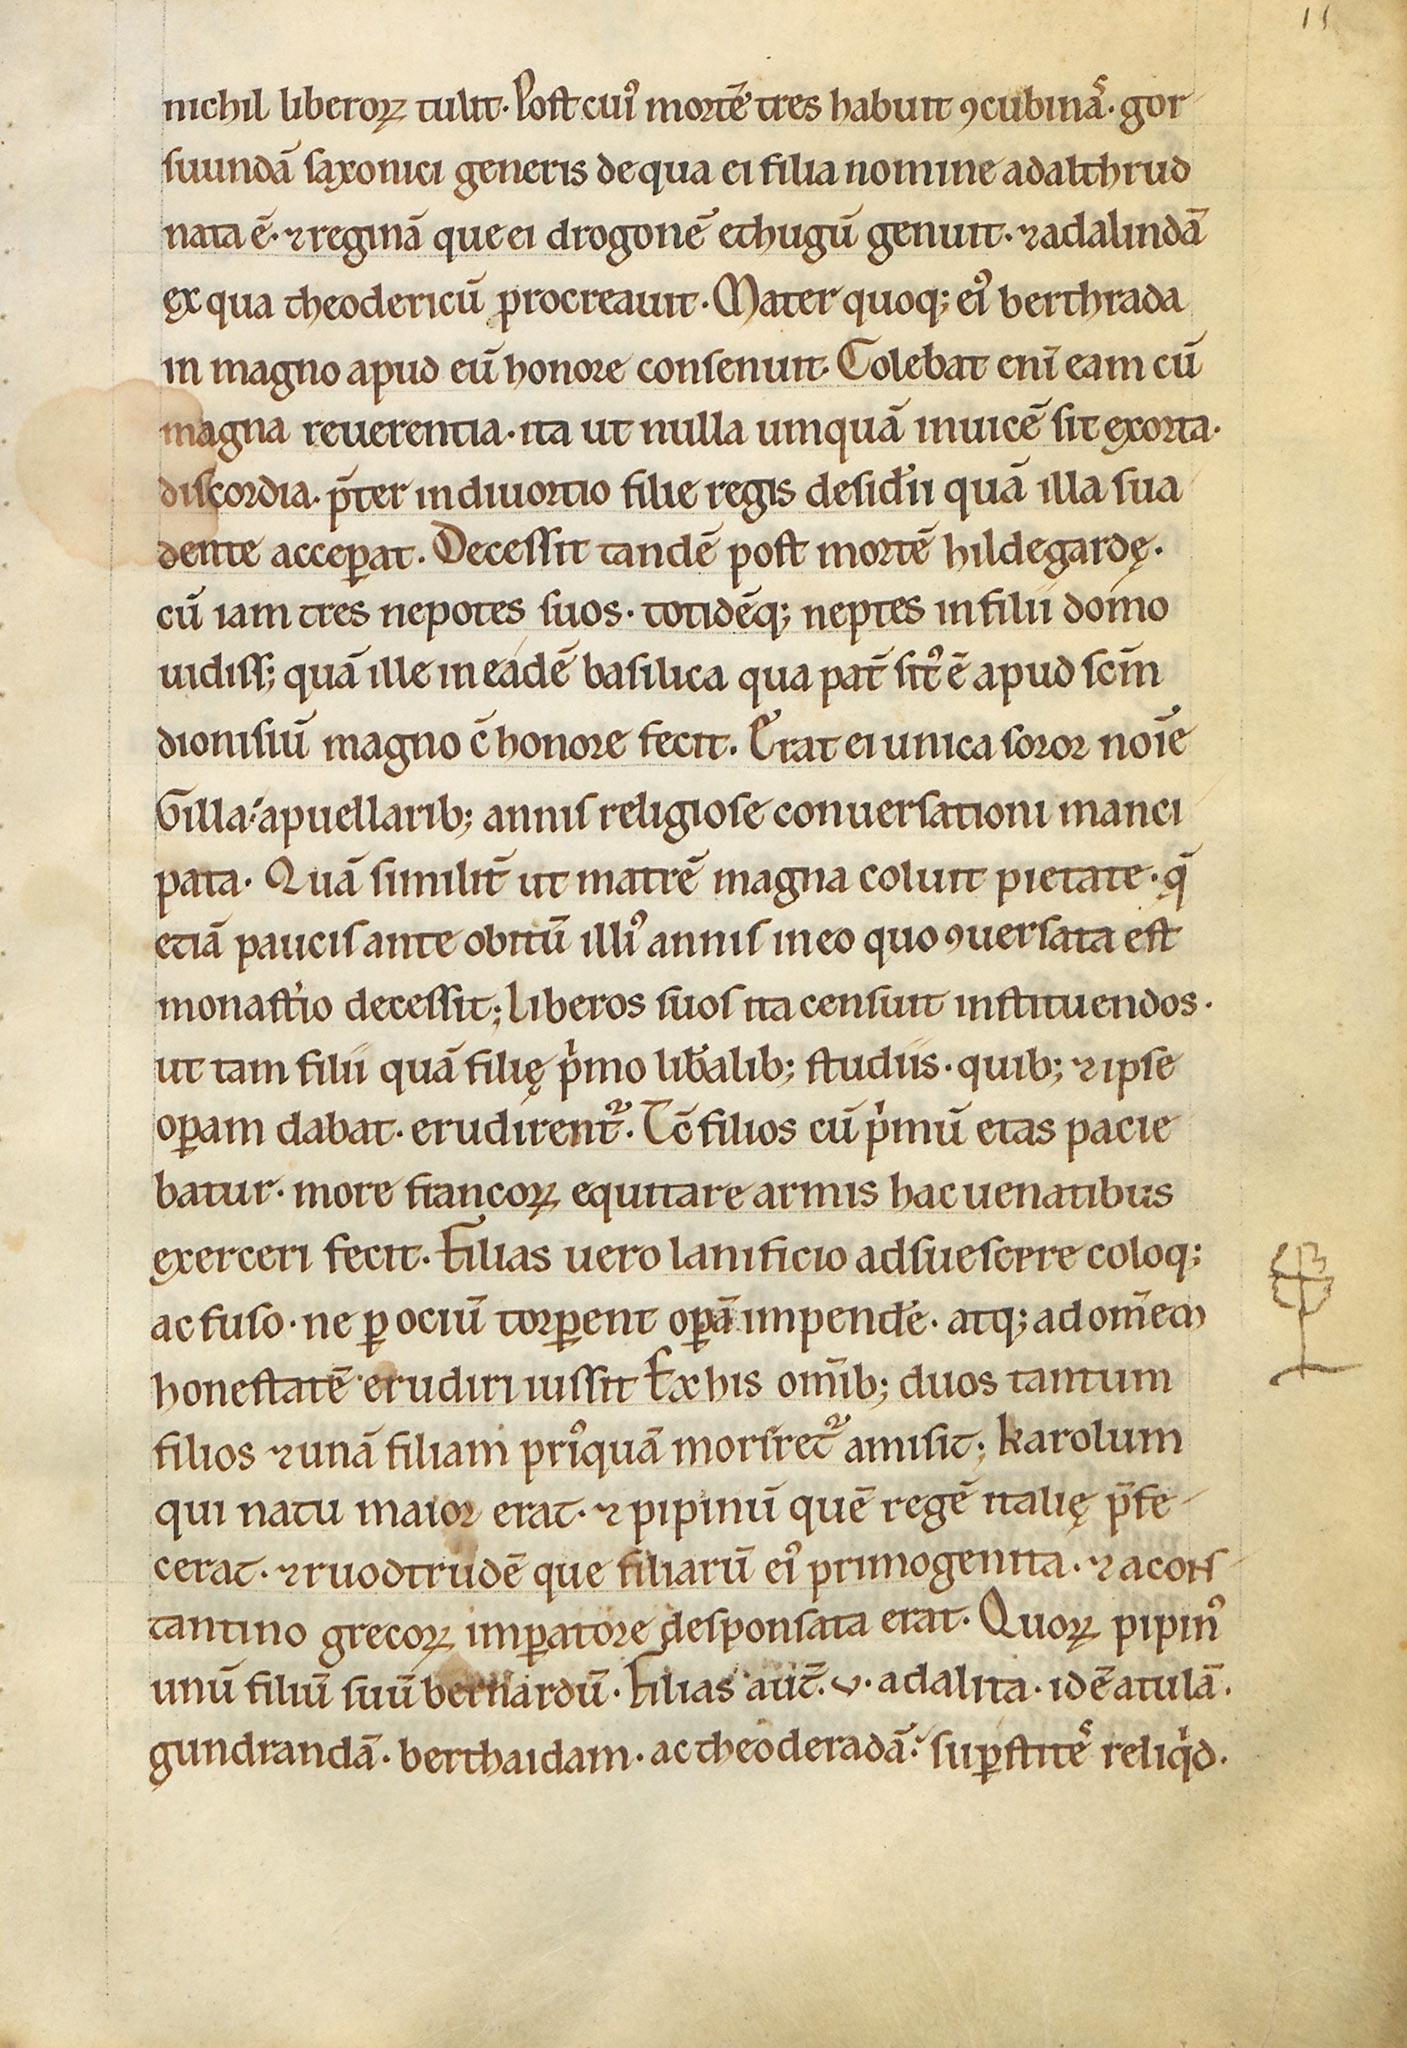 Manuscrit-Vita-Karoli-11r°